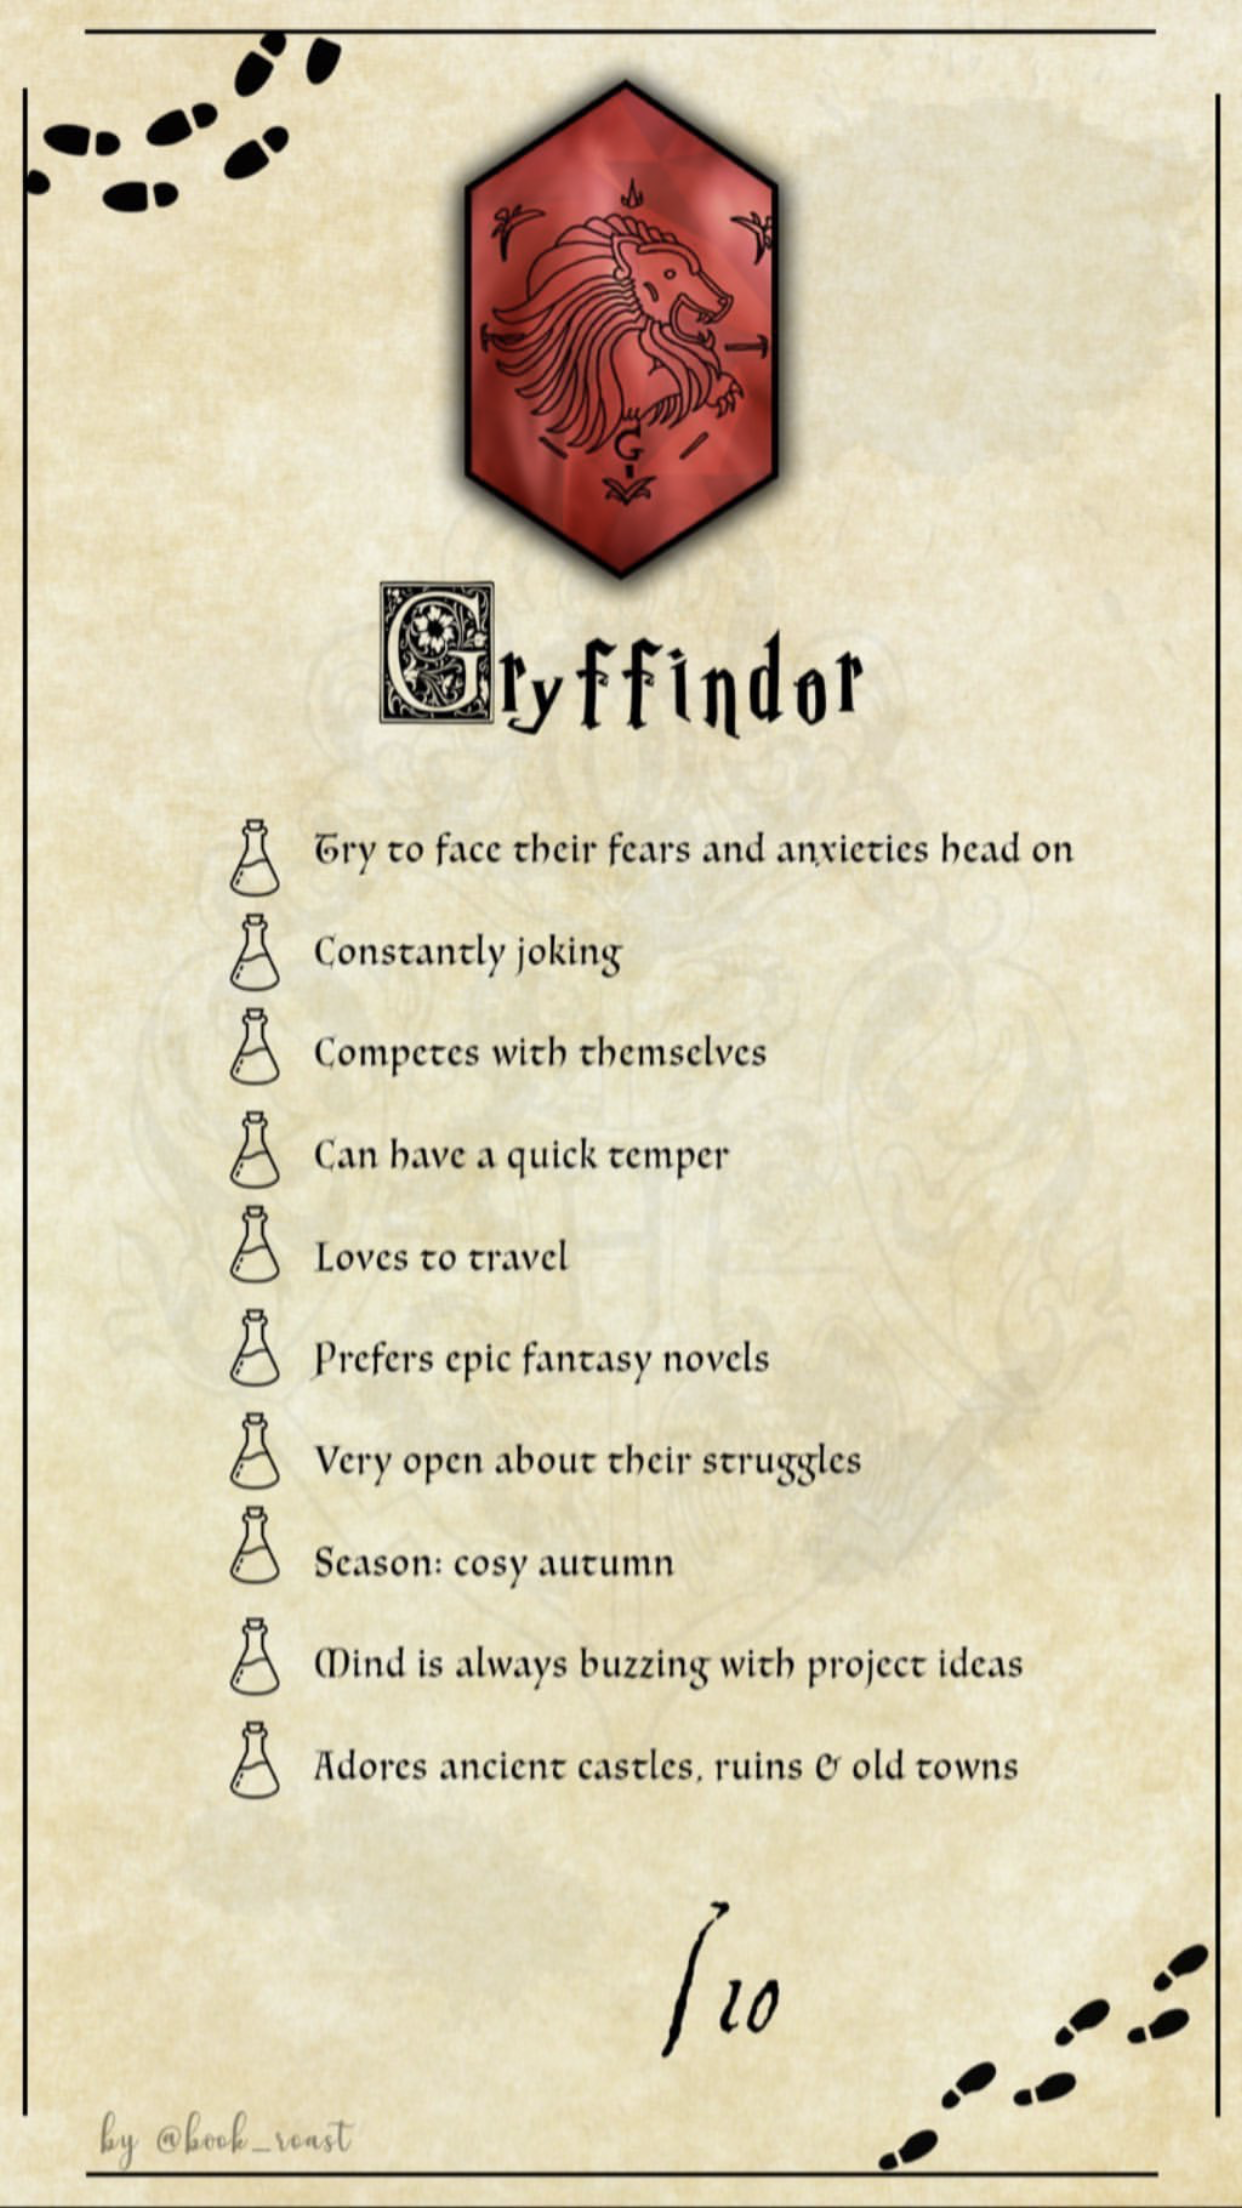 Pin By Deborah Thomas On Templates Harry Potter Poster Harry Potter Tumblr Harry Potter Spells